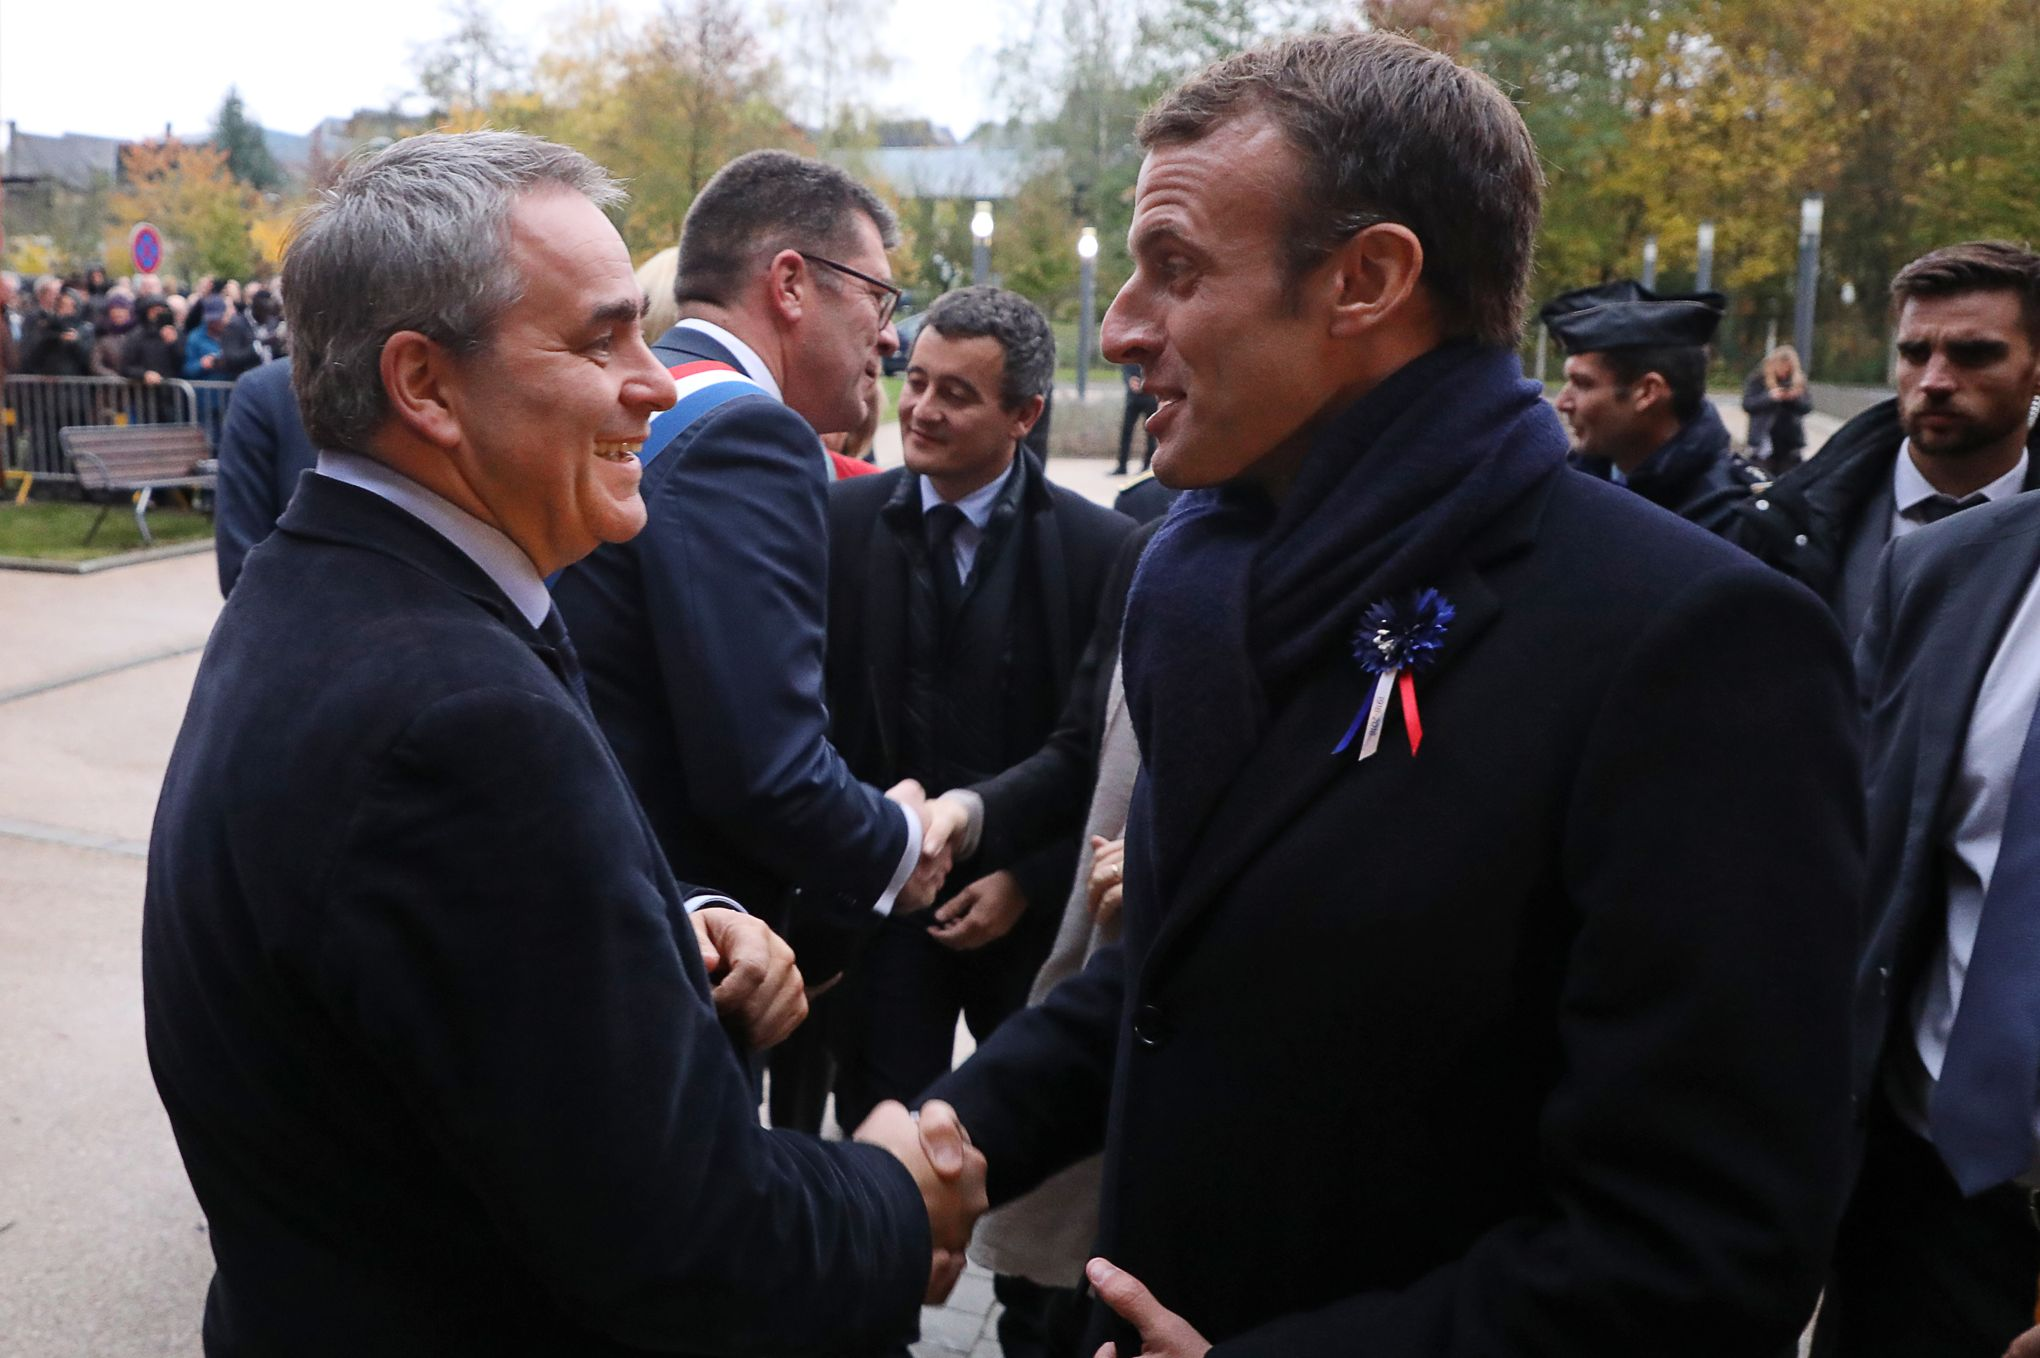 Calendrier Meeting Macron 2019.Grand Debat Hauts De France Bretagne Pays De Loire Corse